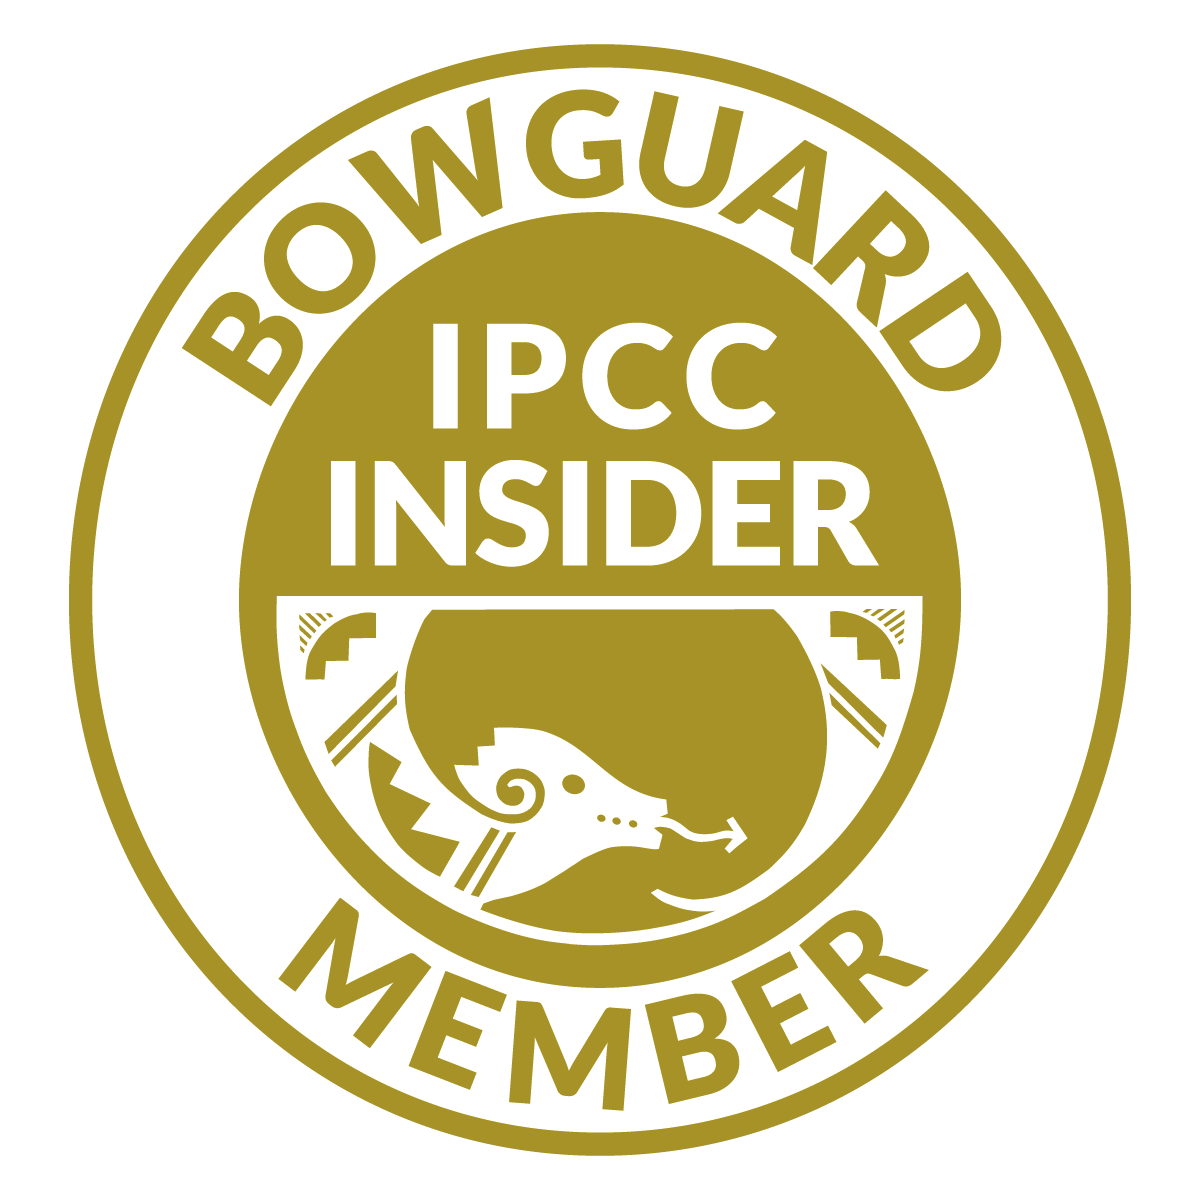 Bowguard Indian Pueblo Cultural Center Membership Level